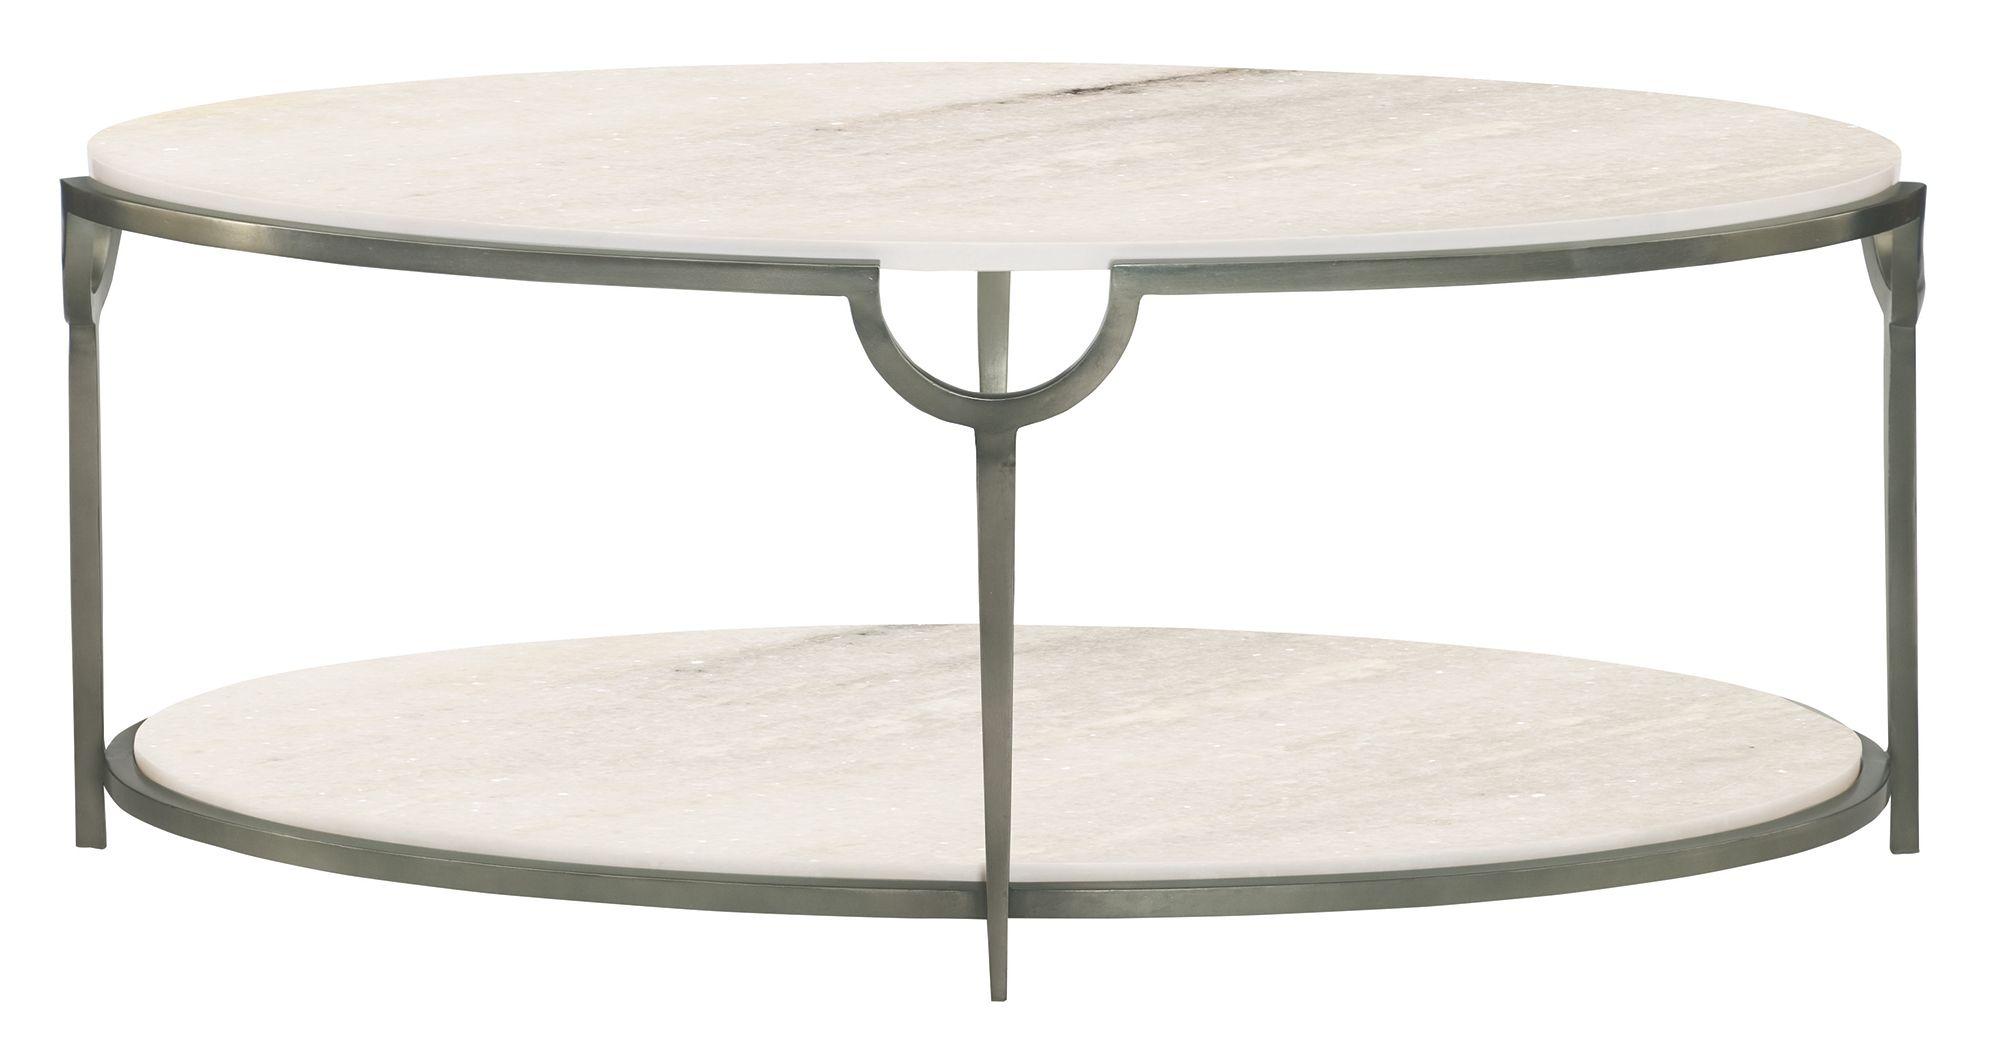 46w26h18 1 2h item 469 013 oxidized nickel faux carrara marble top